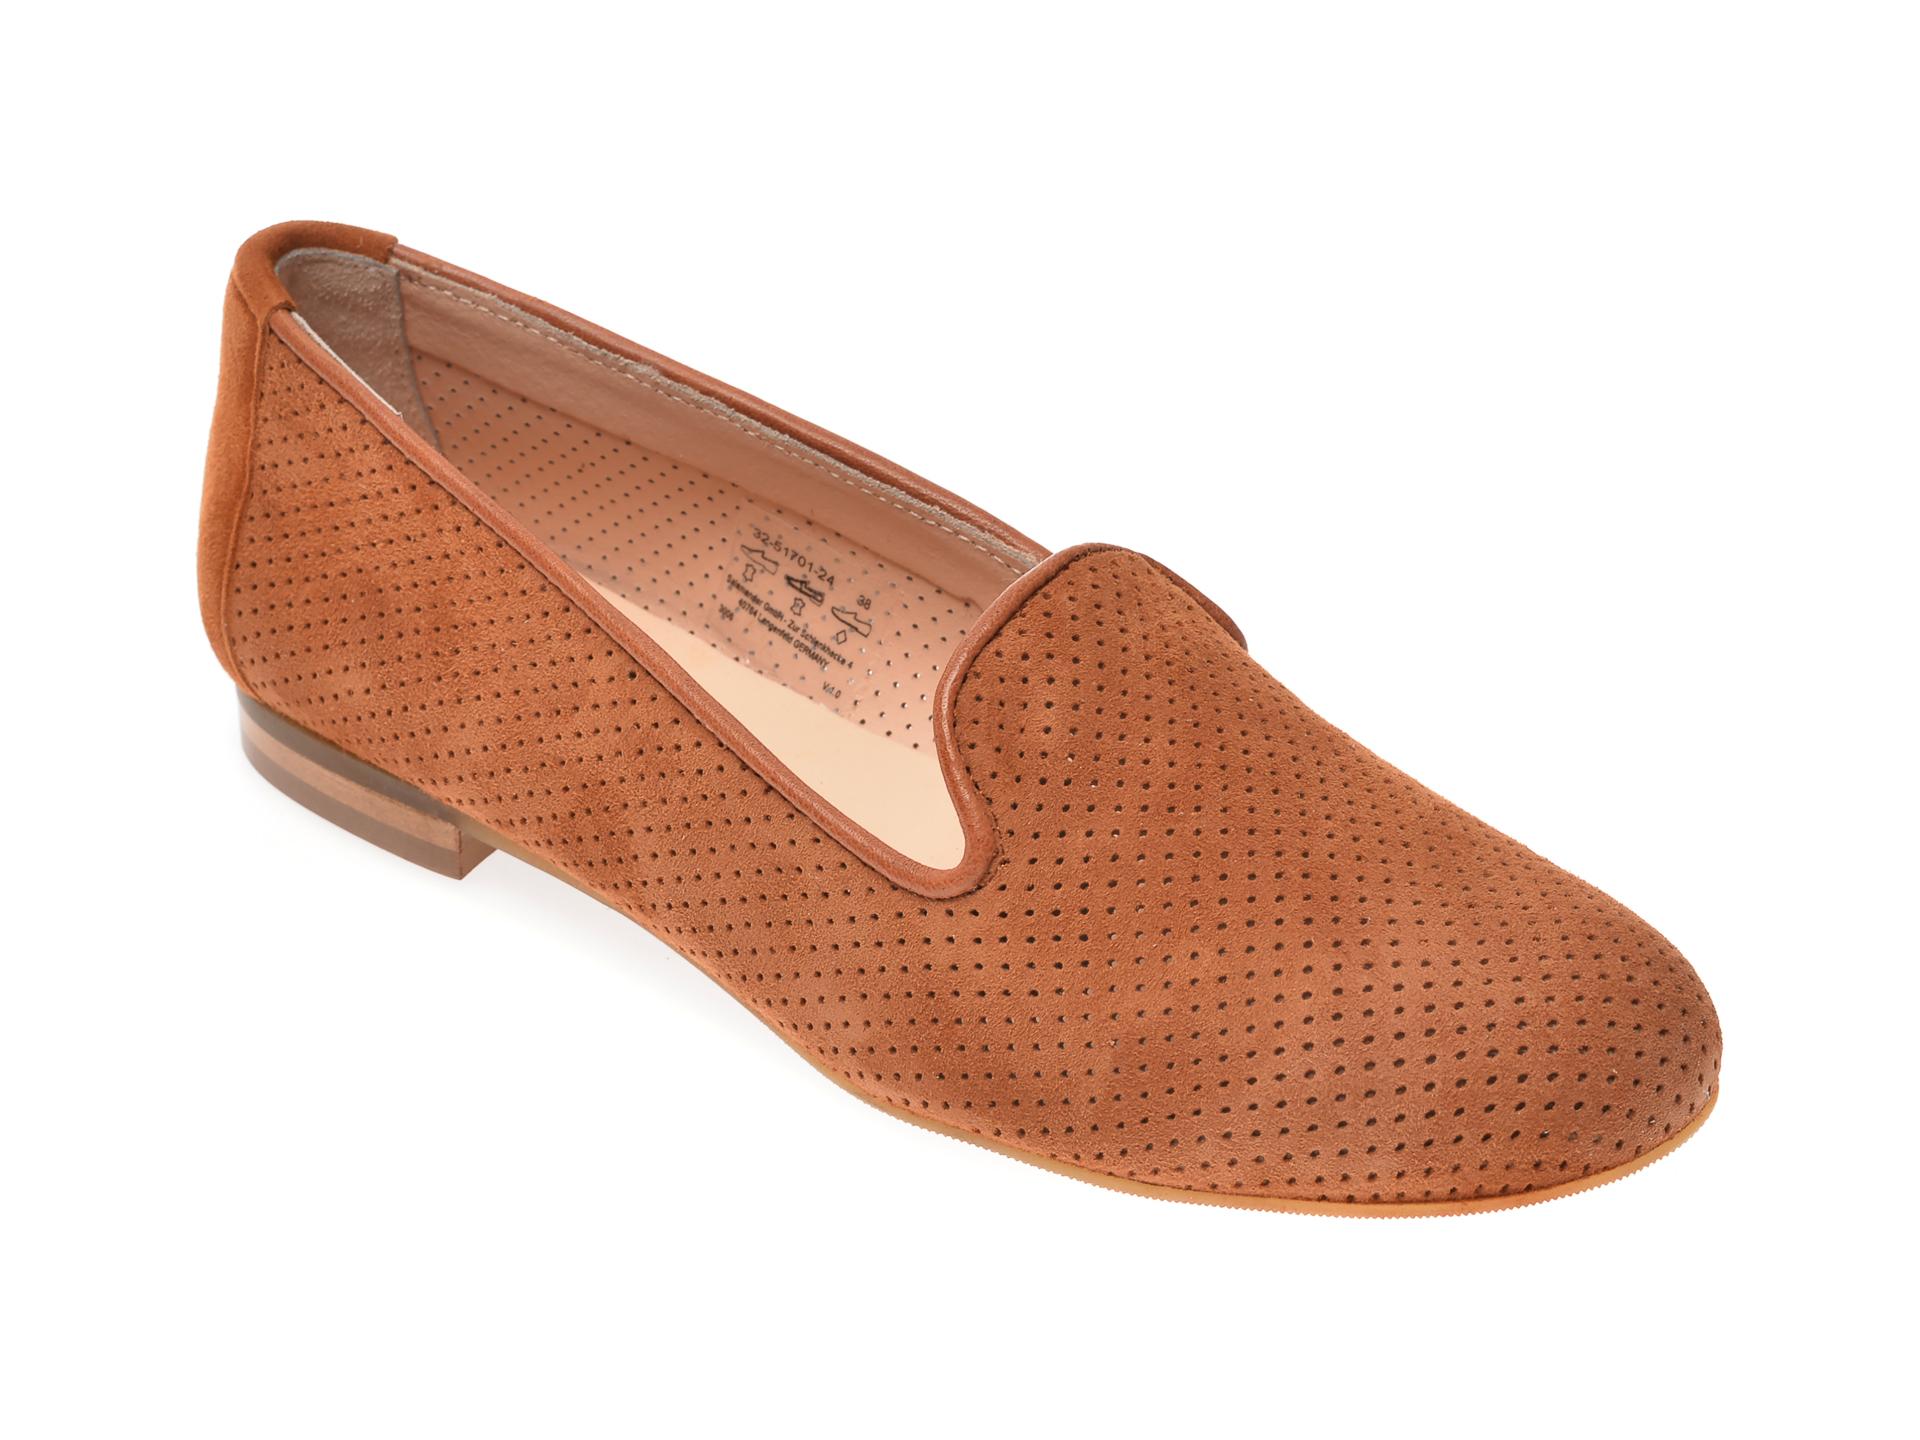 Pantofi SALAMANDER maro, 51701, din piele intoarsa